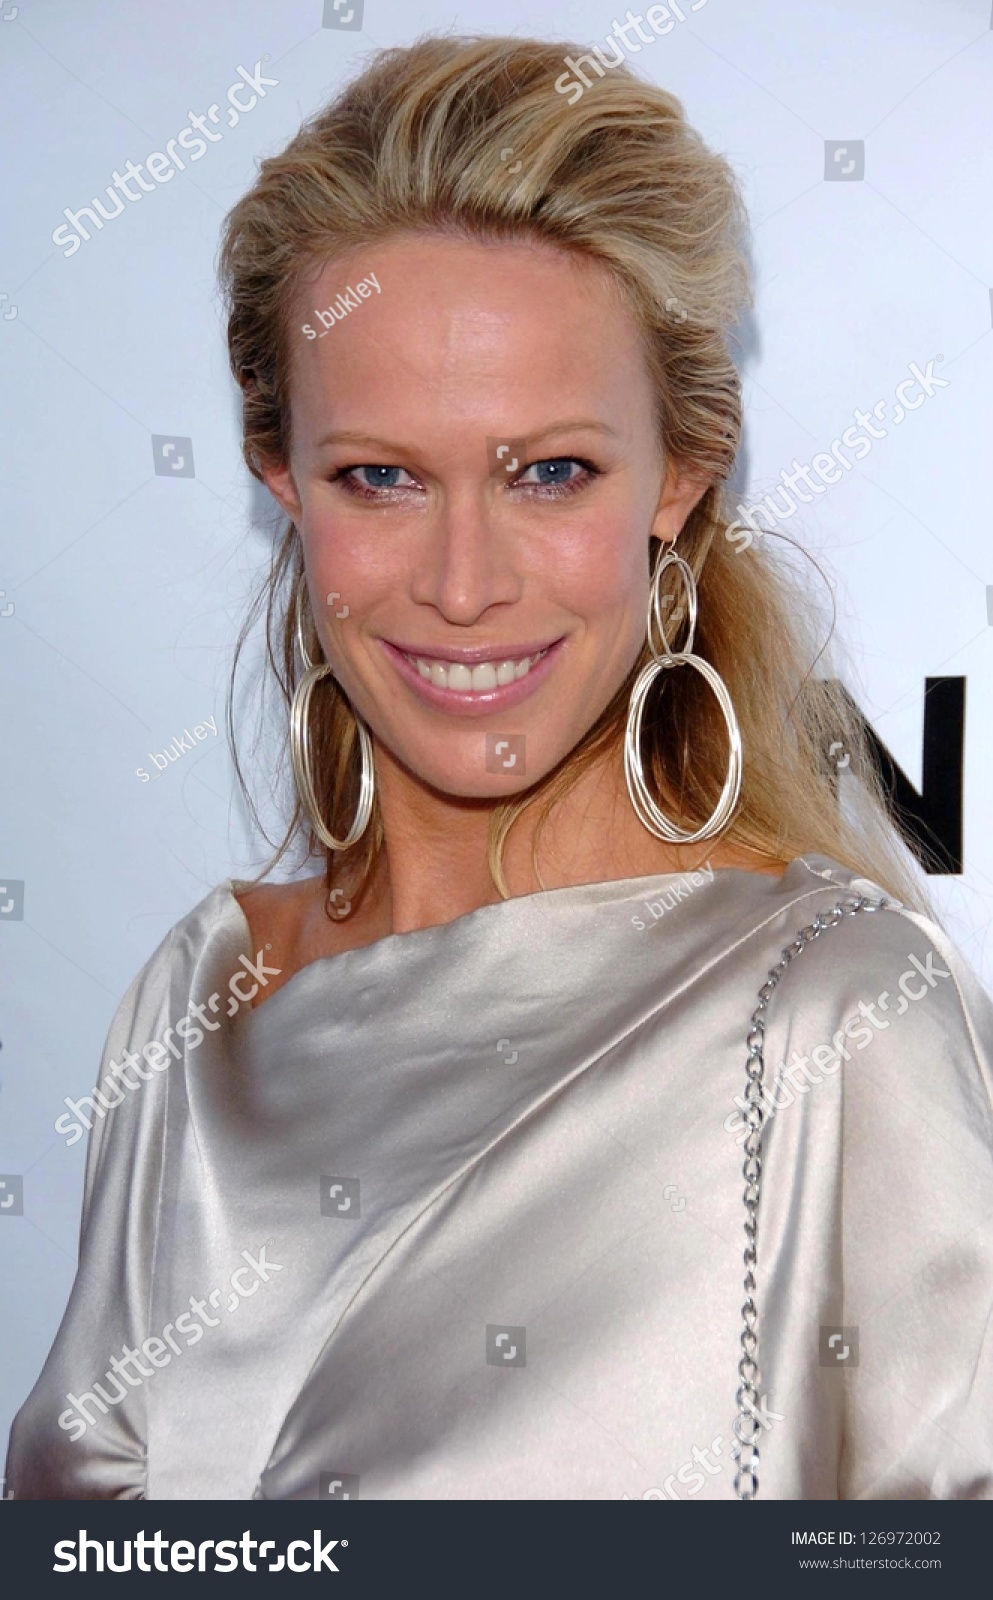 Roxanne (model),Evelyn Keyes Adult clips Dustin Milligan,Tara Reid